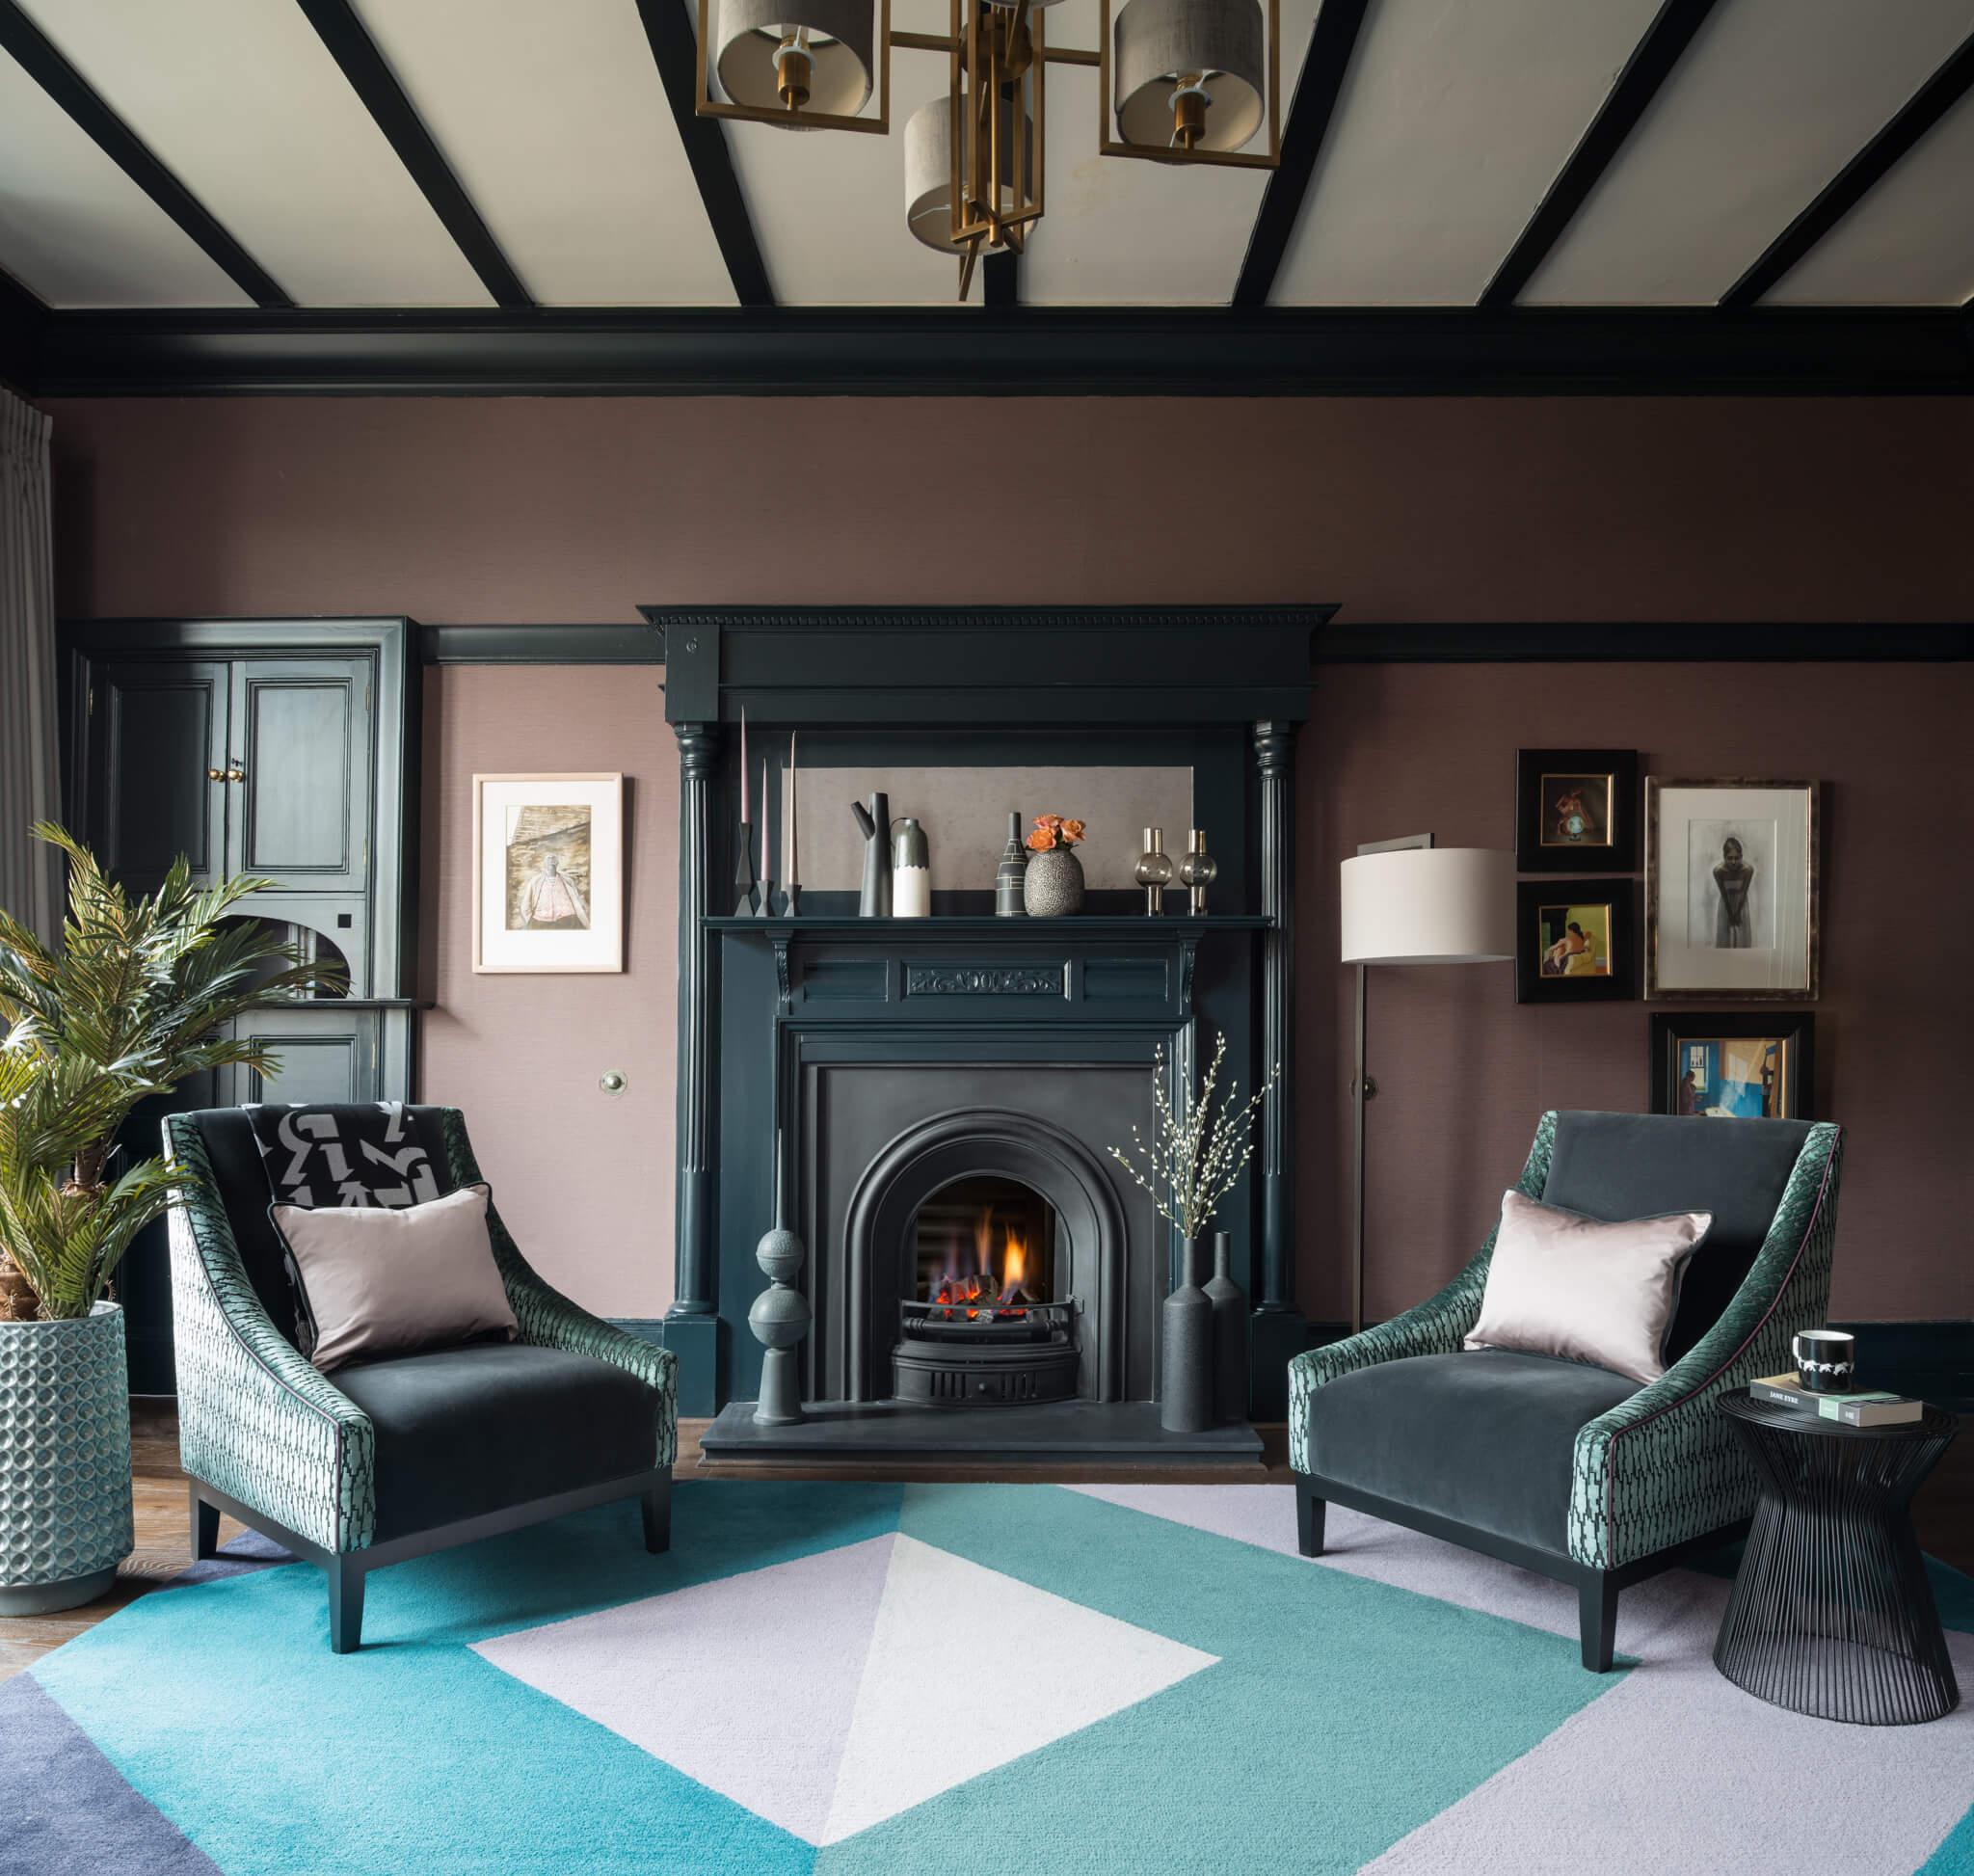 Print-Livingroom-to-fire-Chelsea-Mclaine-Interiors-Introductory-Shoot-©ZACandZAC